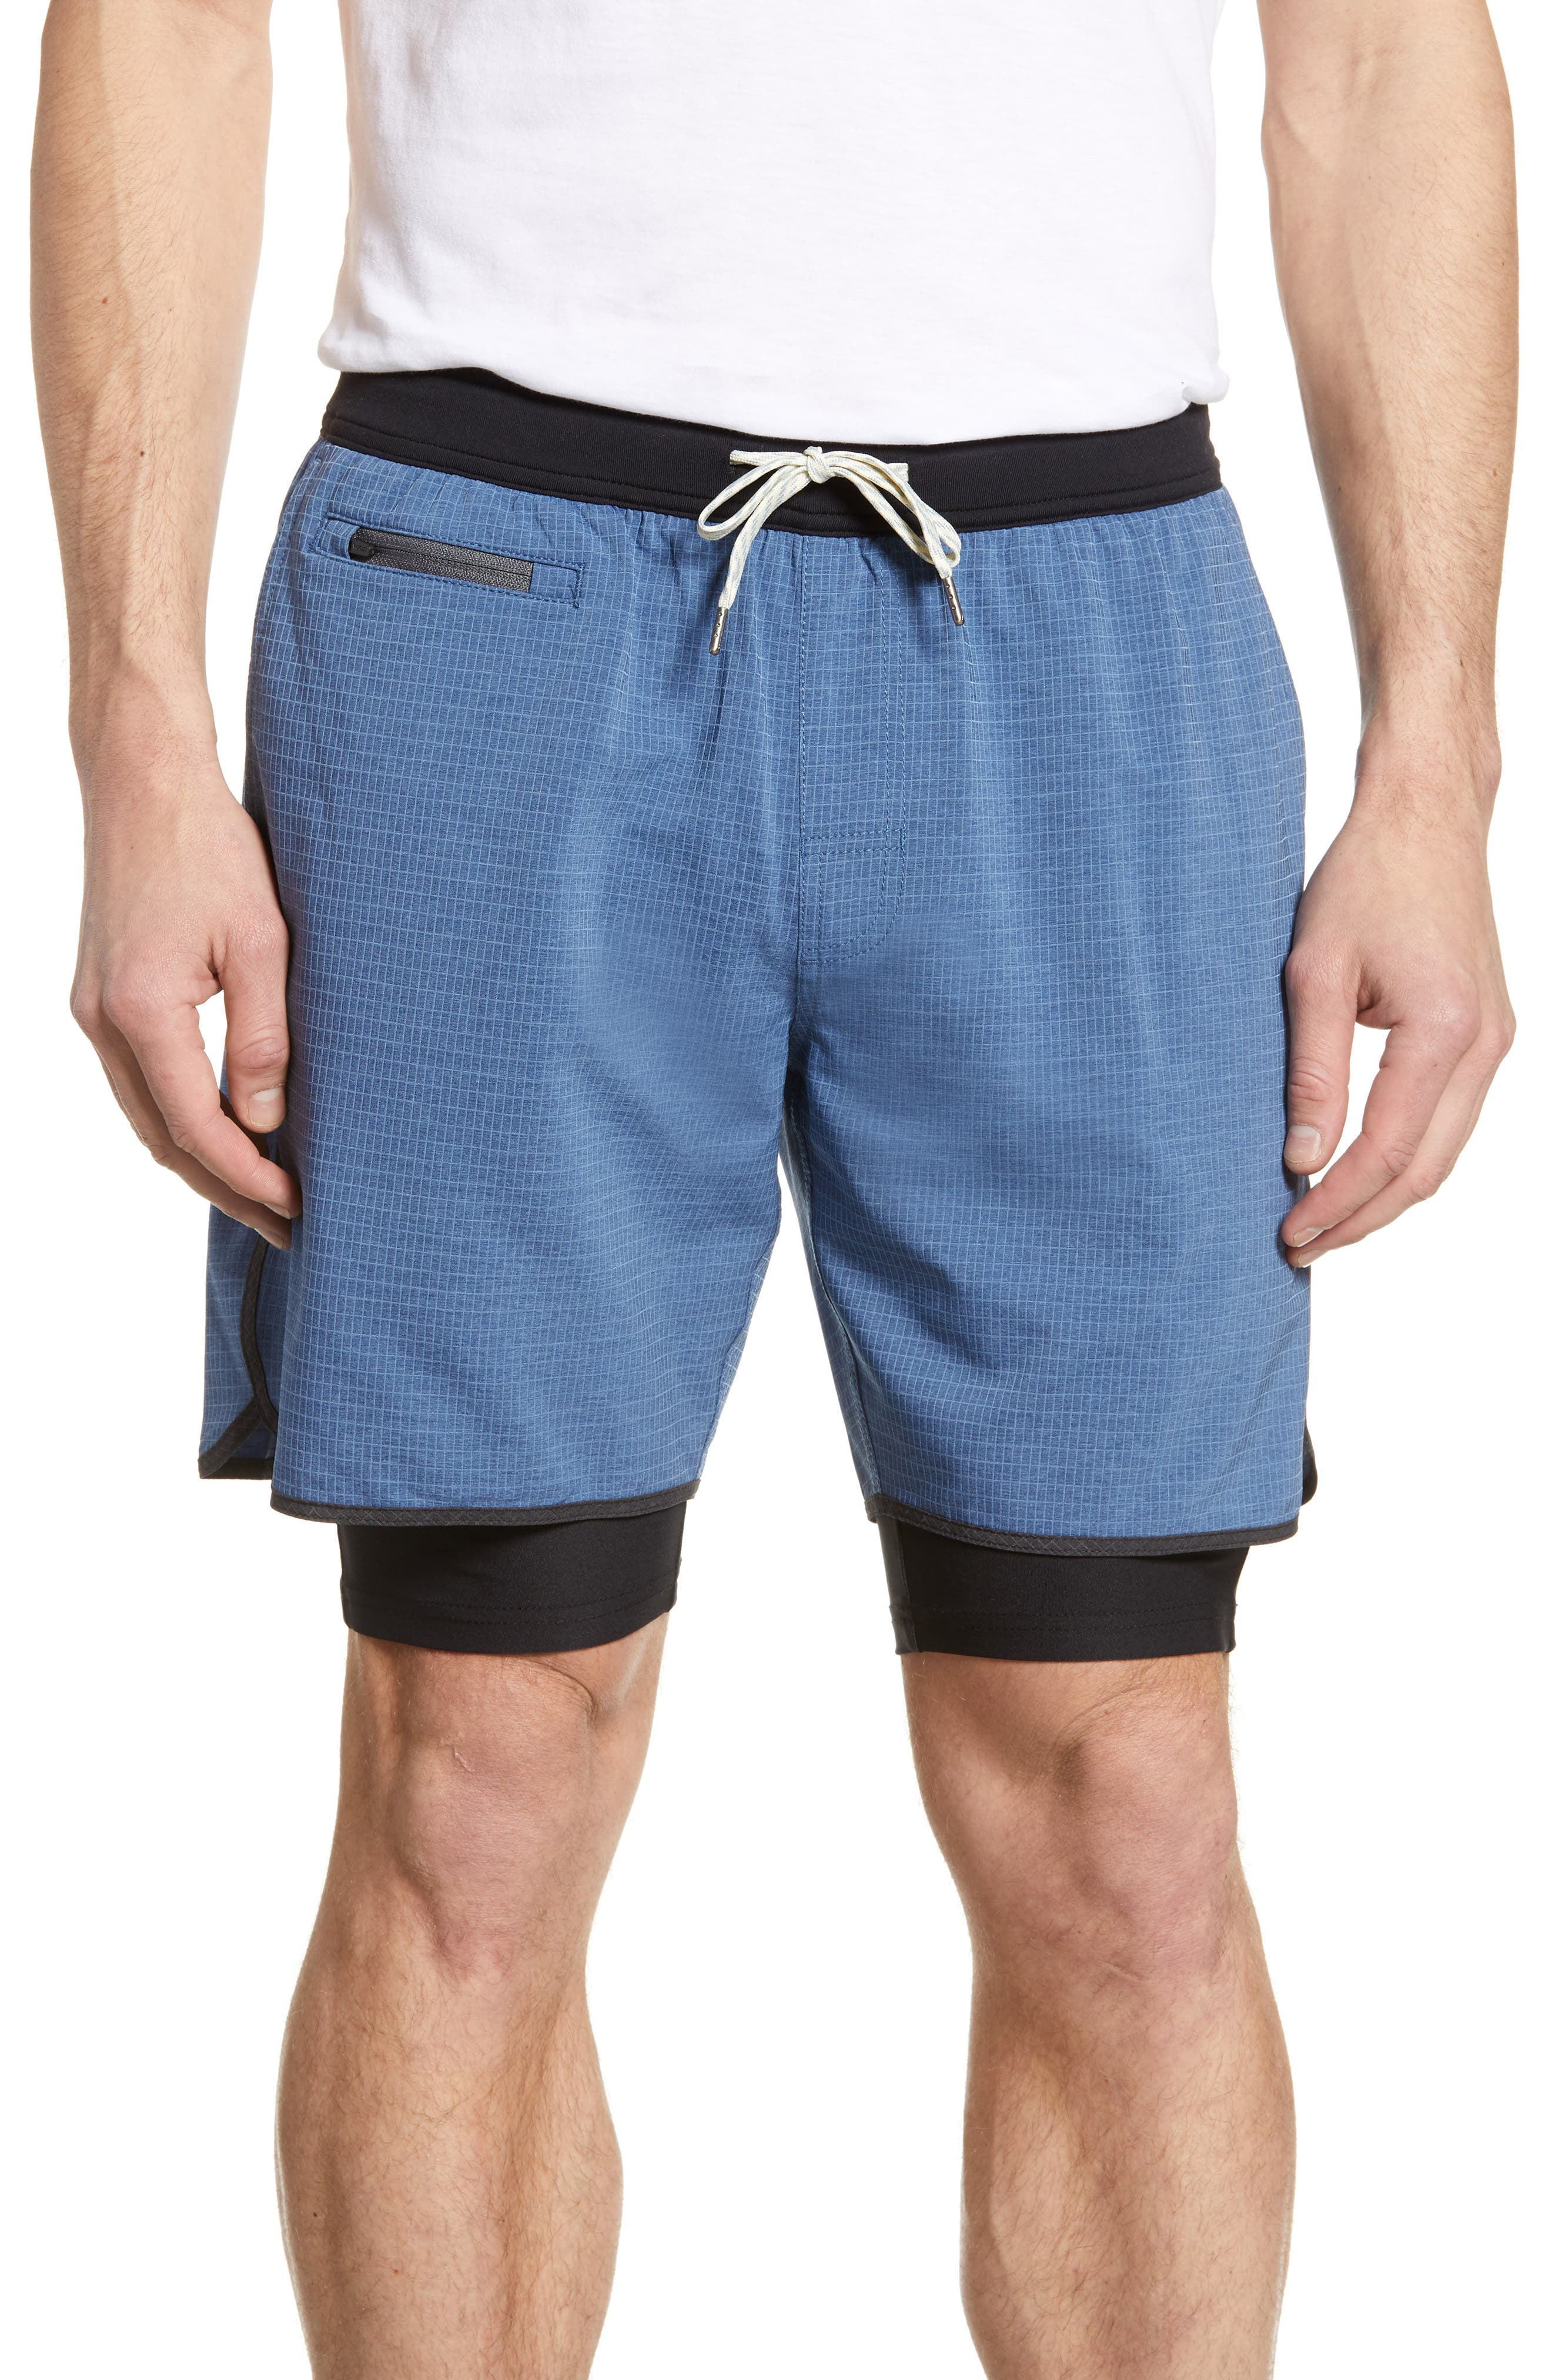 Vuori Stockton Layered Compression Performance Shorts, Blue